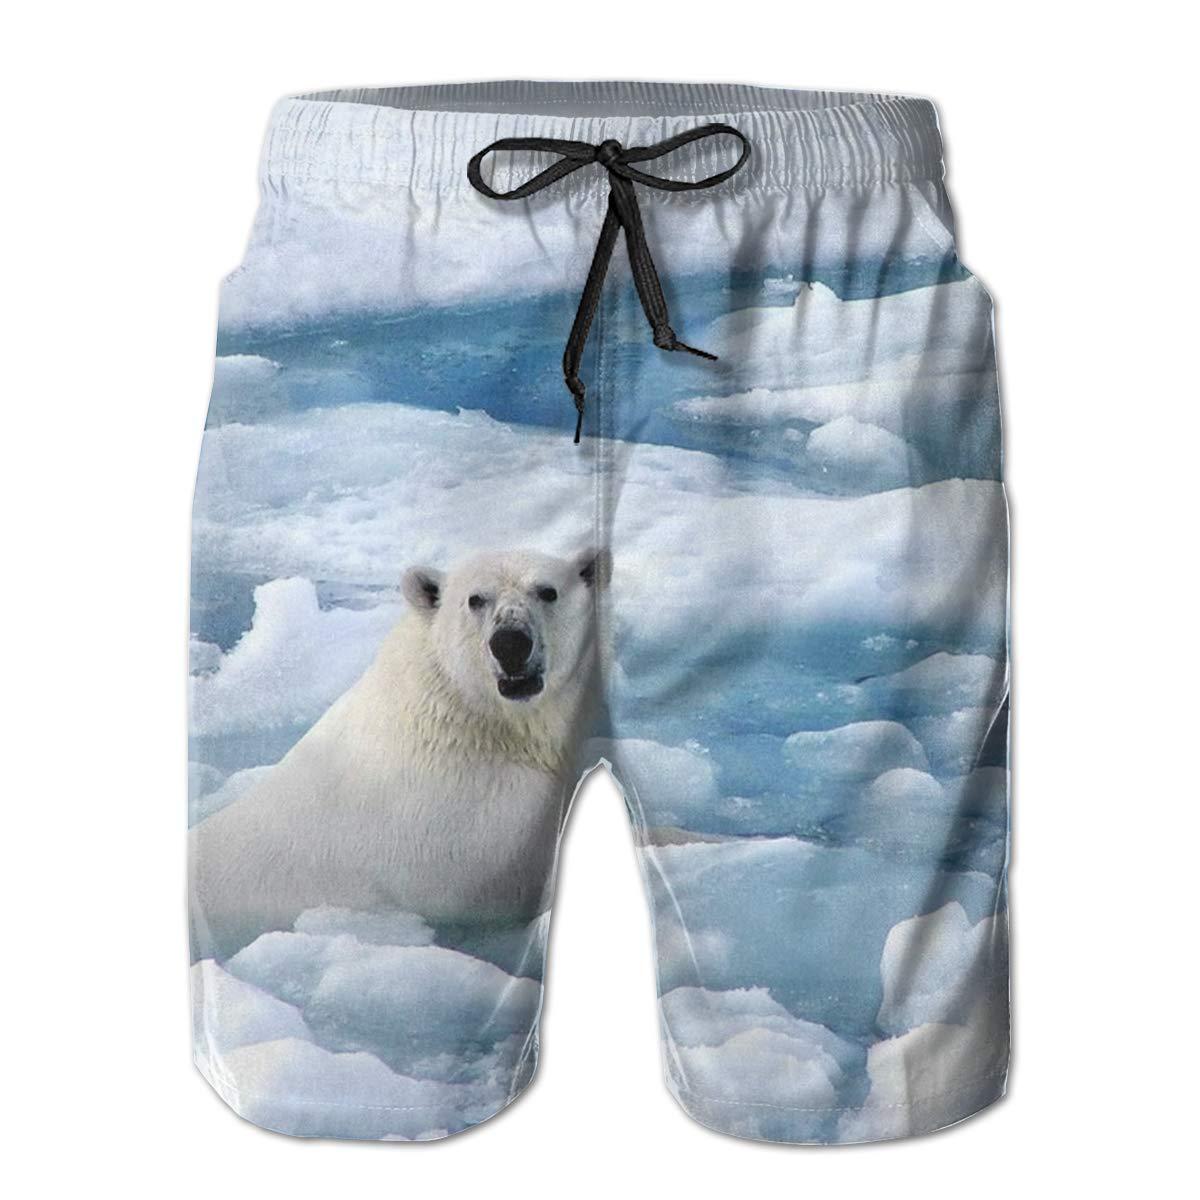 Sunshine Tall Tower Mens Beach Shorts Elastic Waist Pockets Lightweight Swimming Board Short Quick Dry Short Trunks